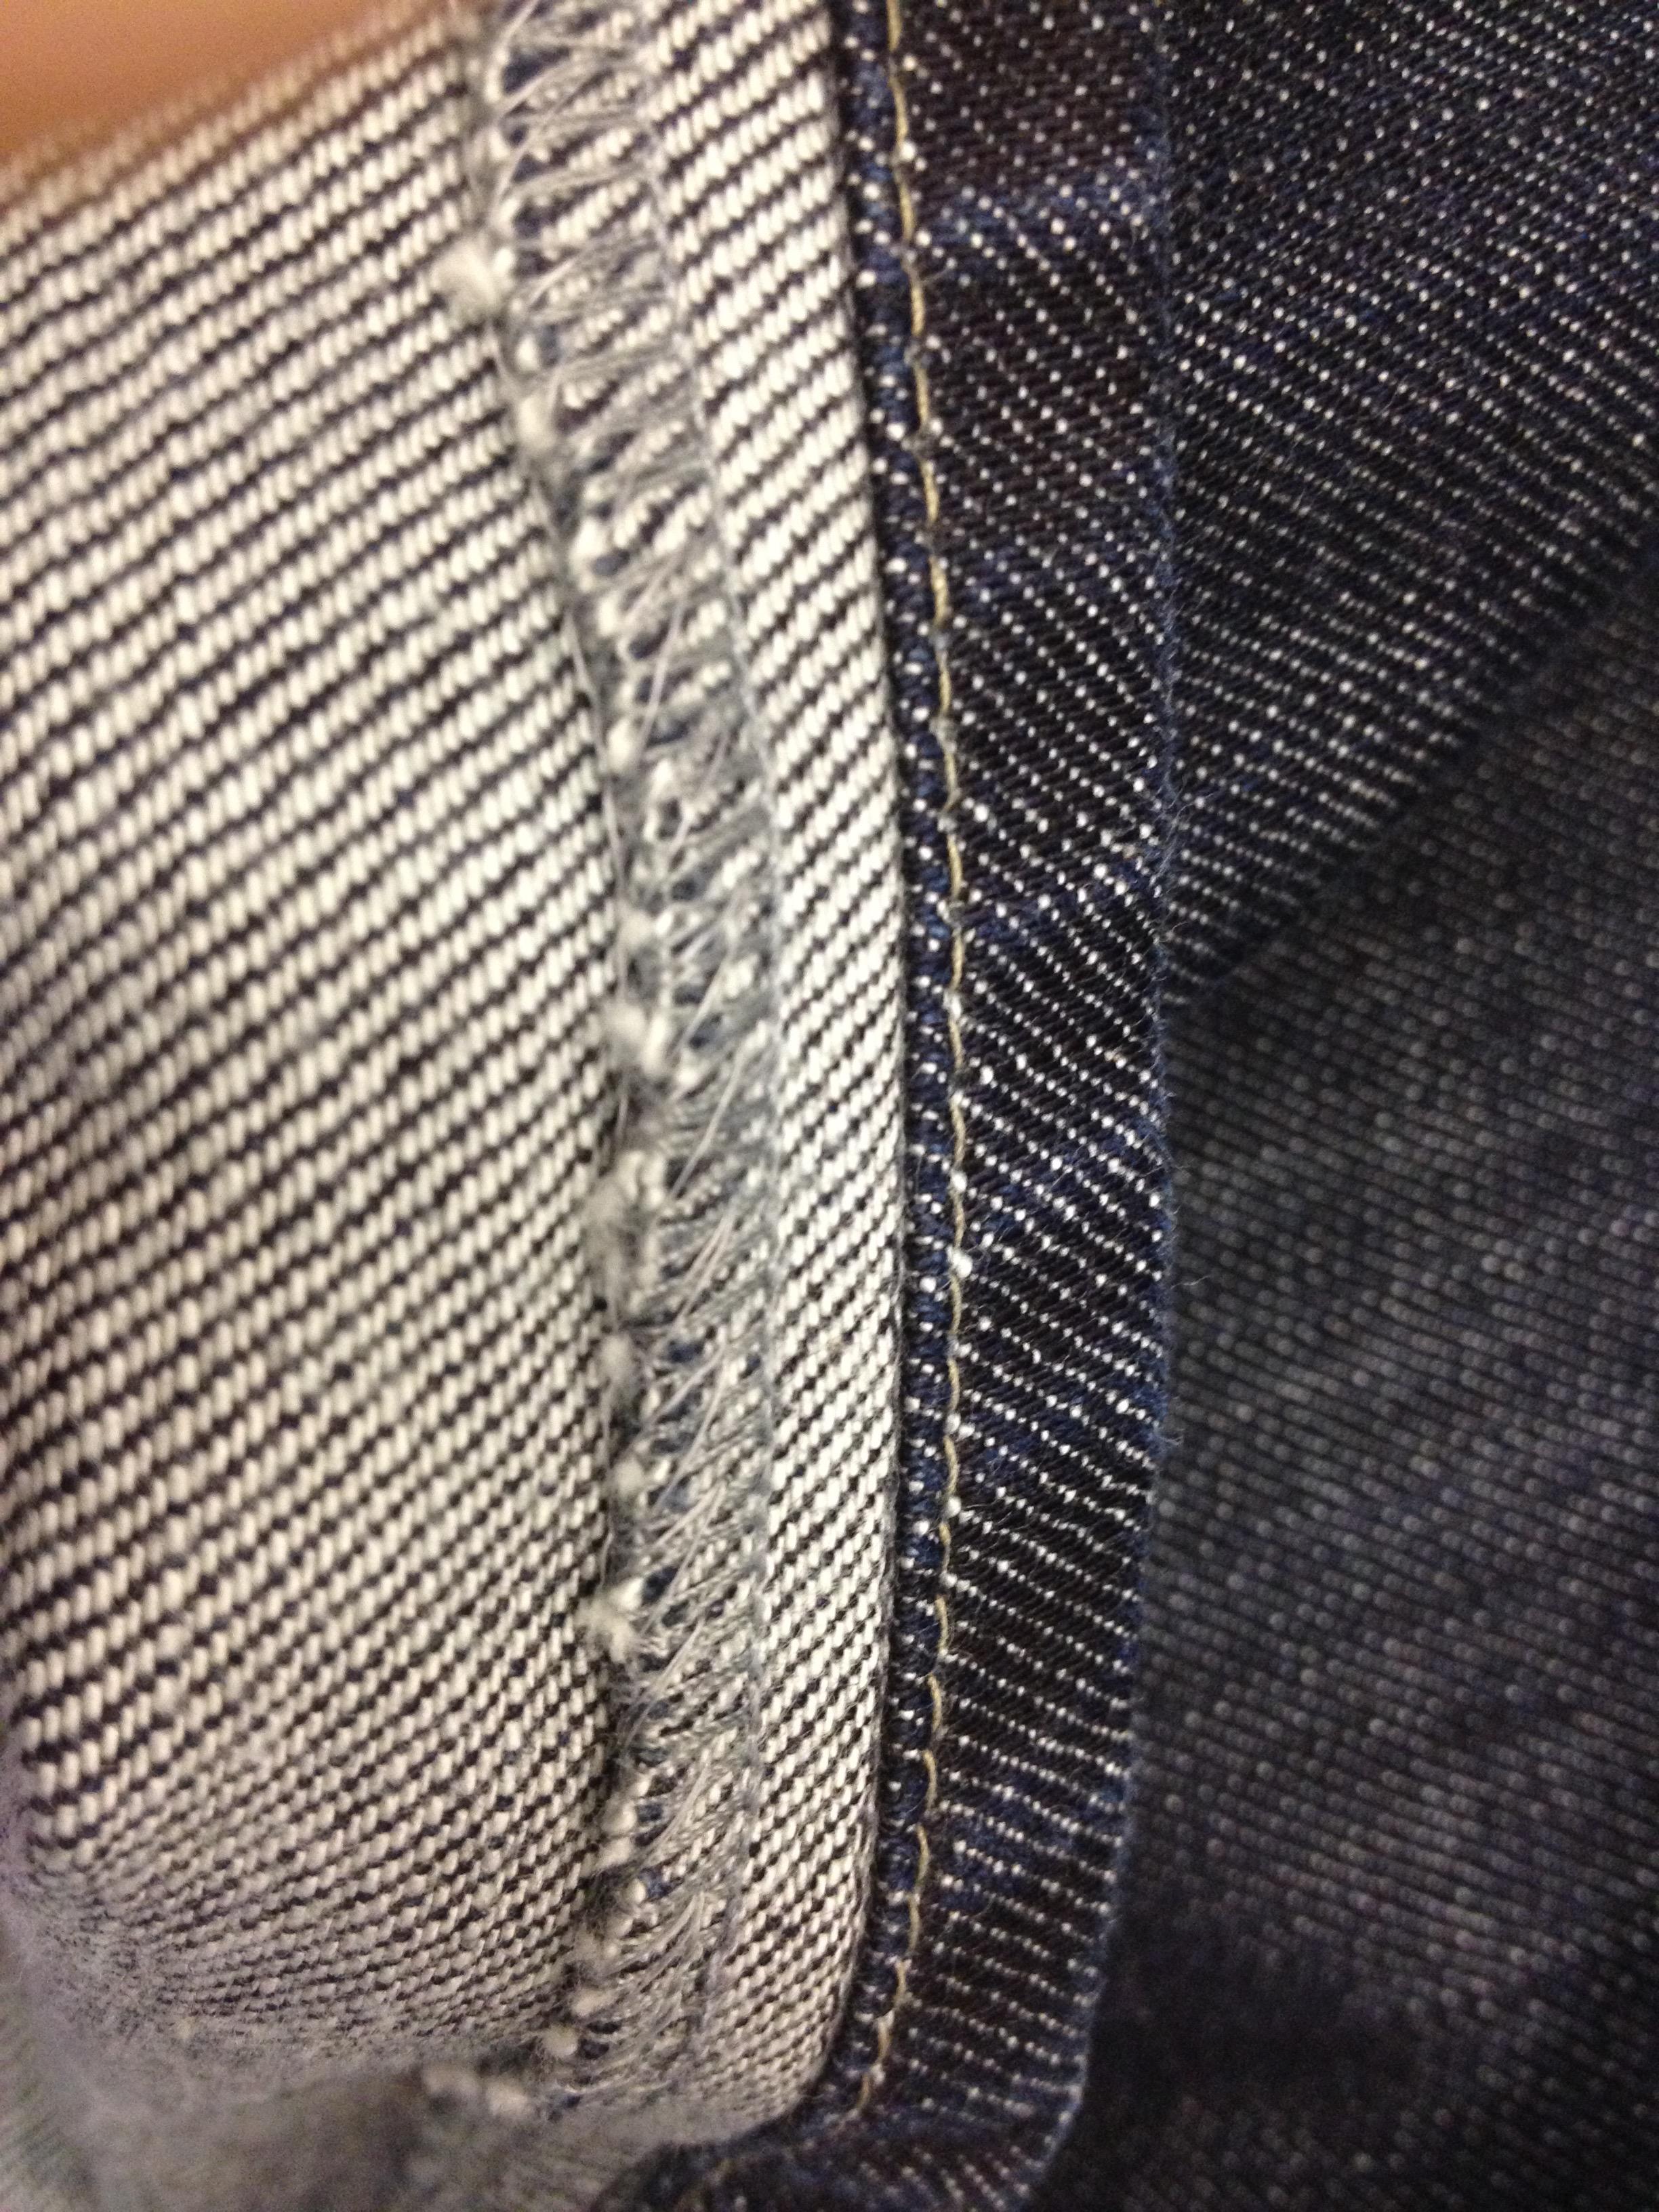 Jeans original hem preserved.jpg